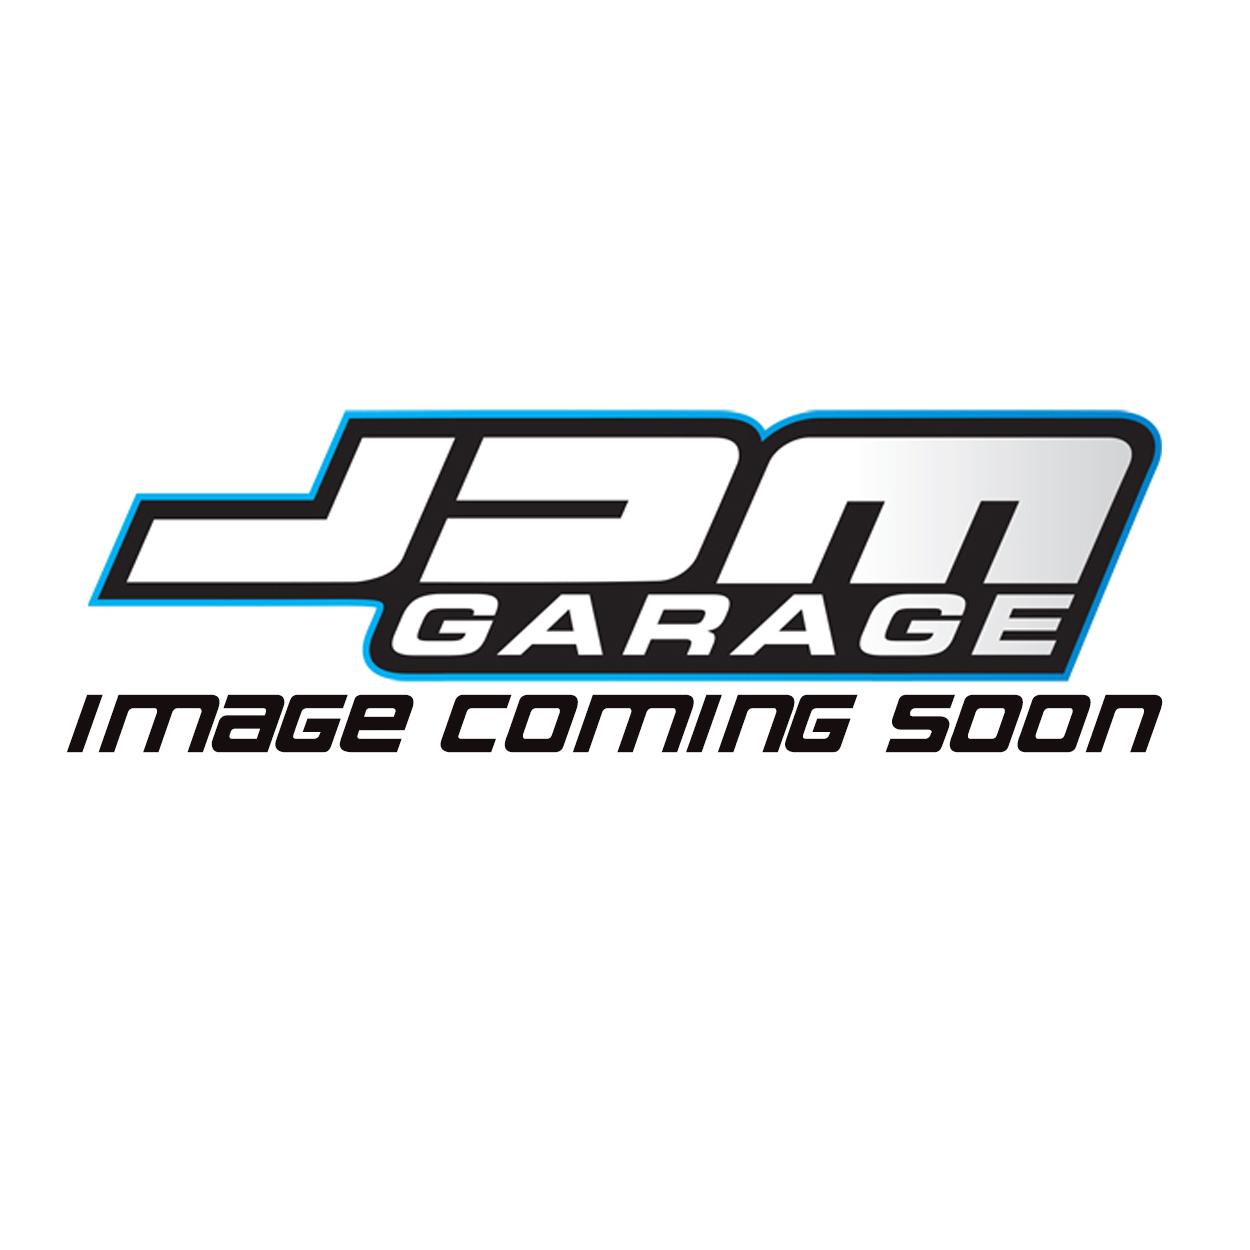 Genuine Nissan Throttle Body Gasket For Nissan Silvia S13 180SX SR20DET 16175-53J00